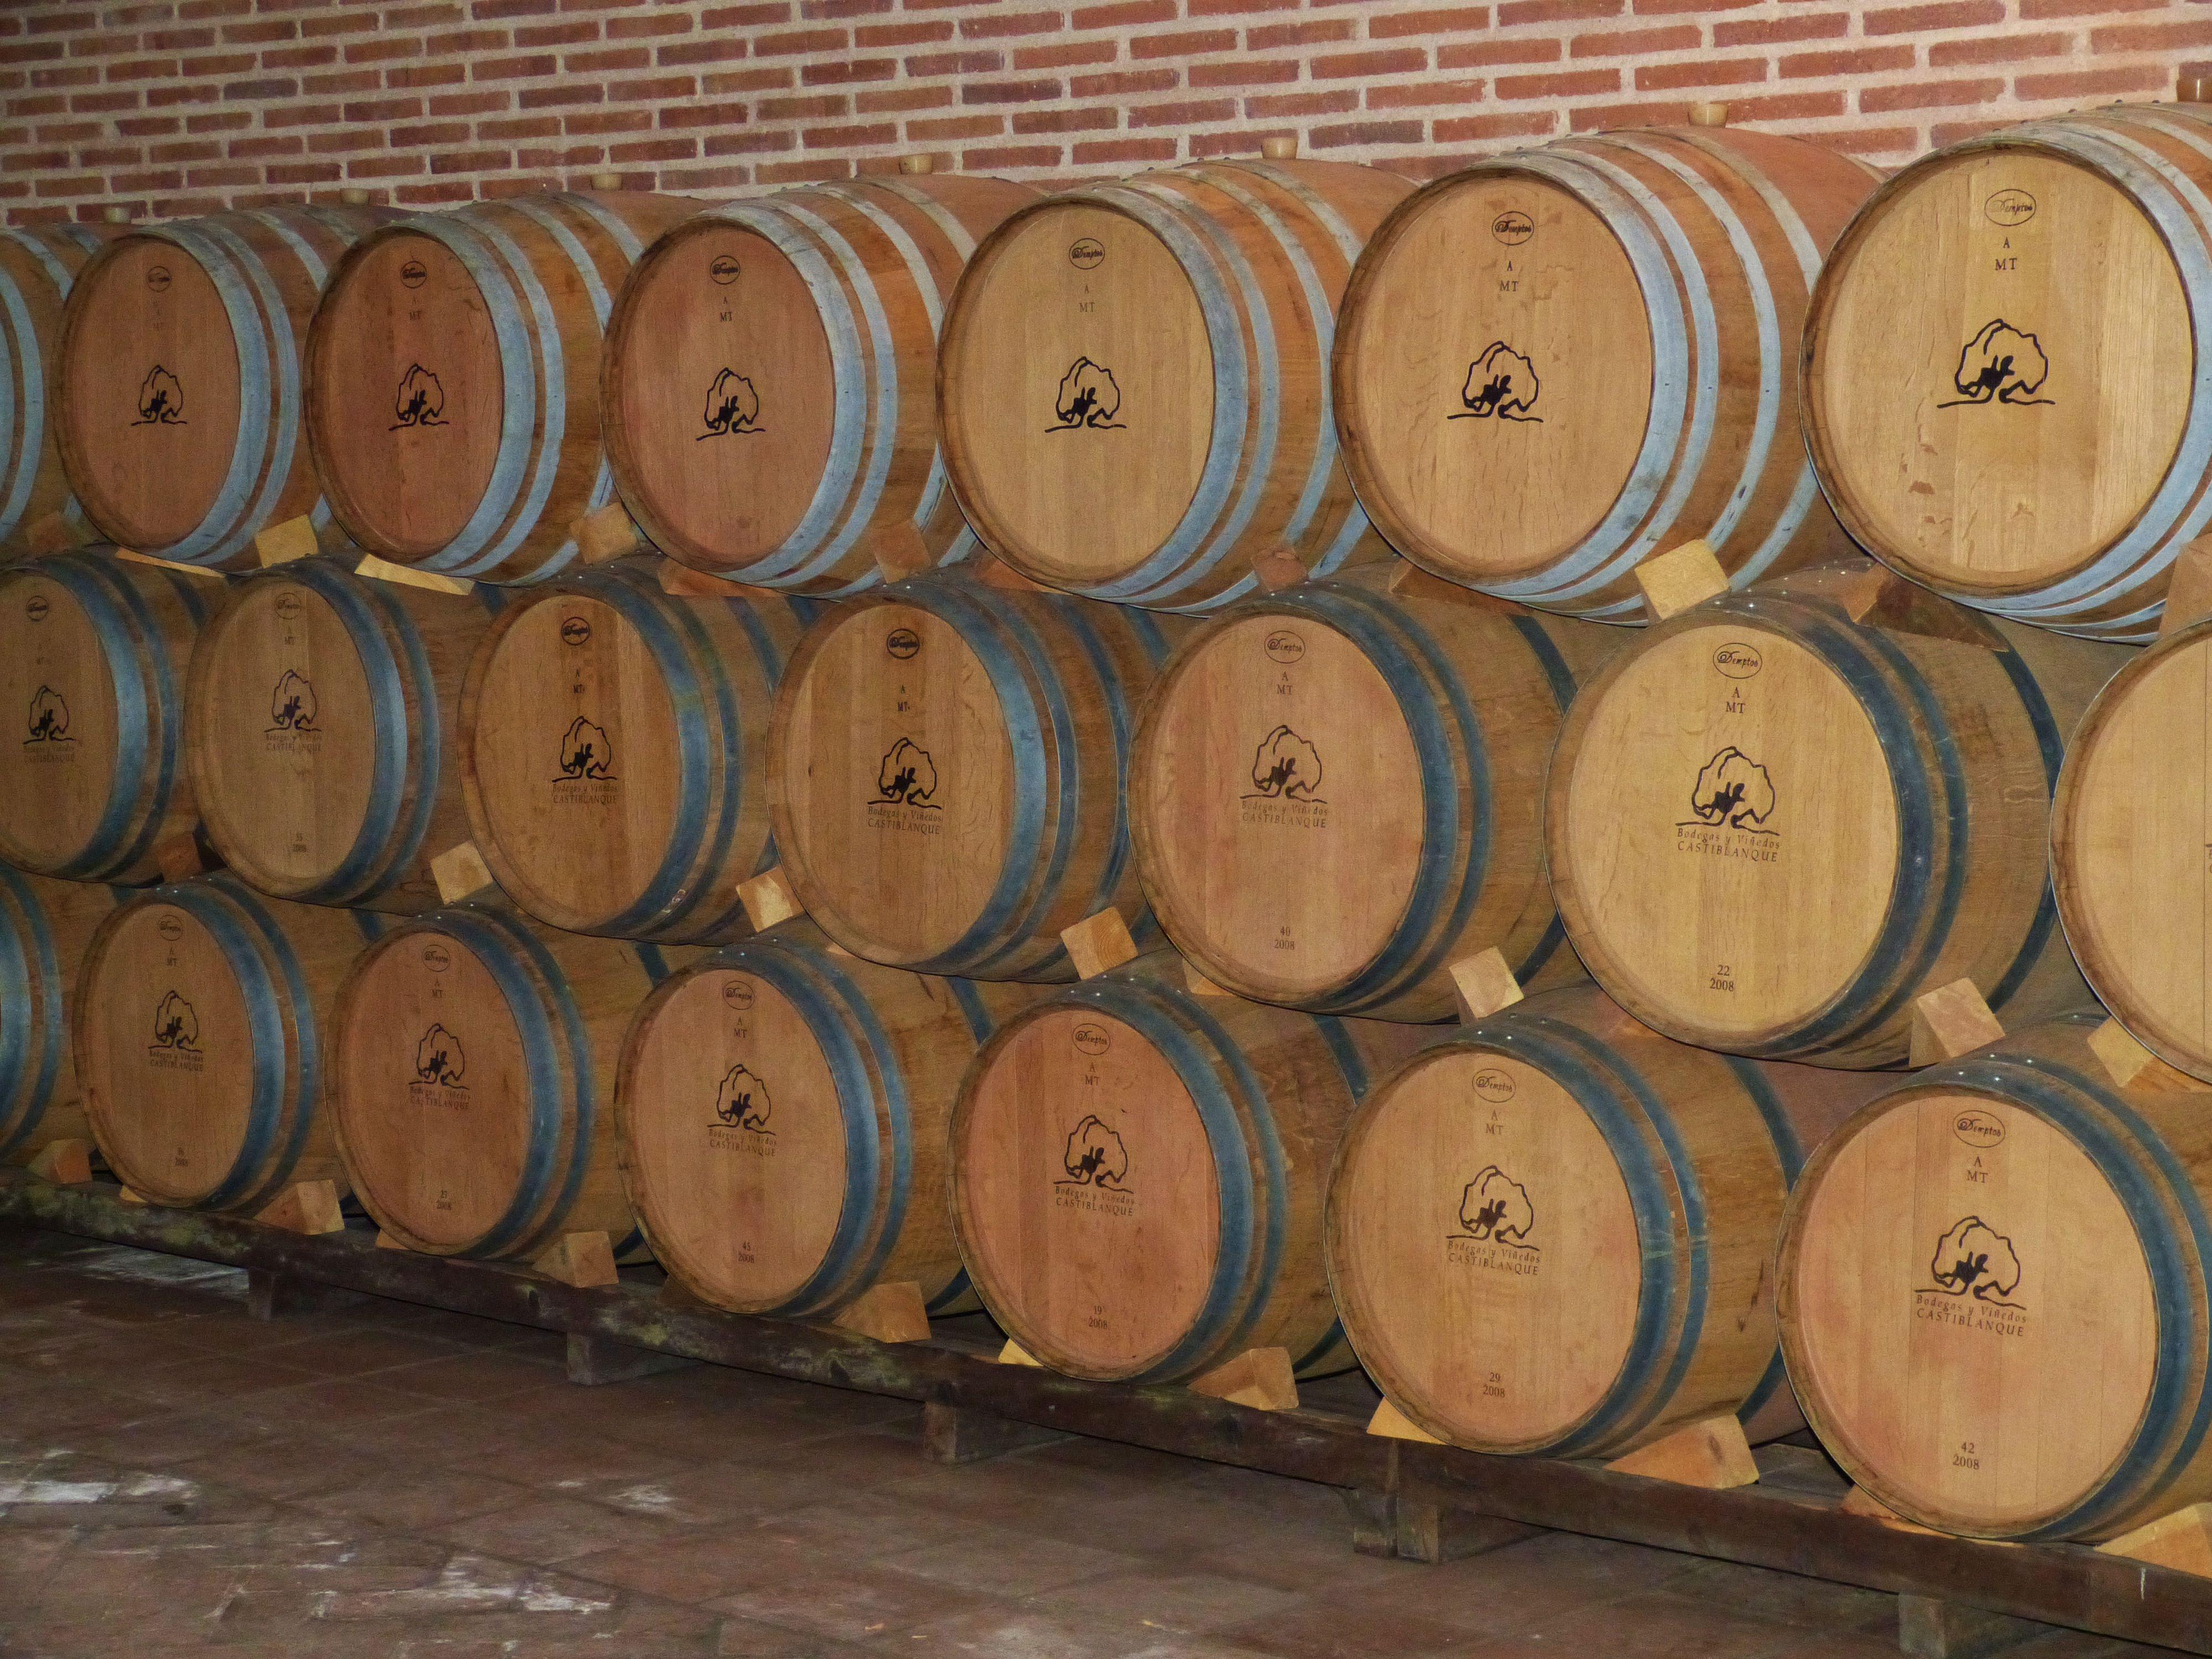 Free Images : wood, barrel, stock, cellar, keller, wooden